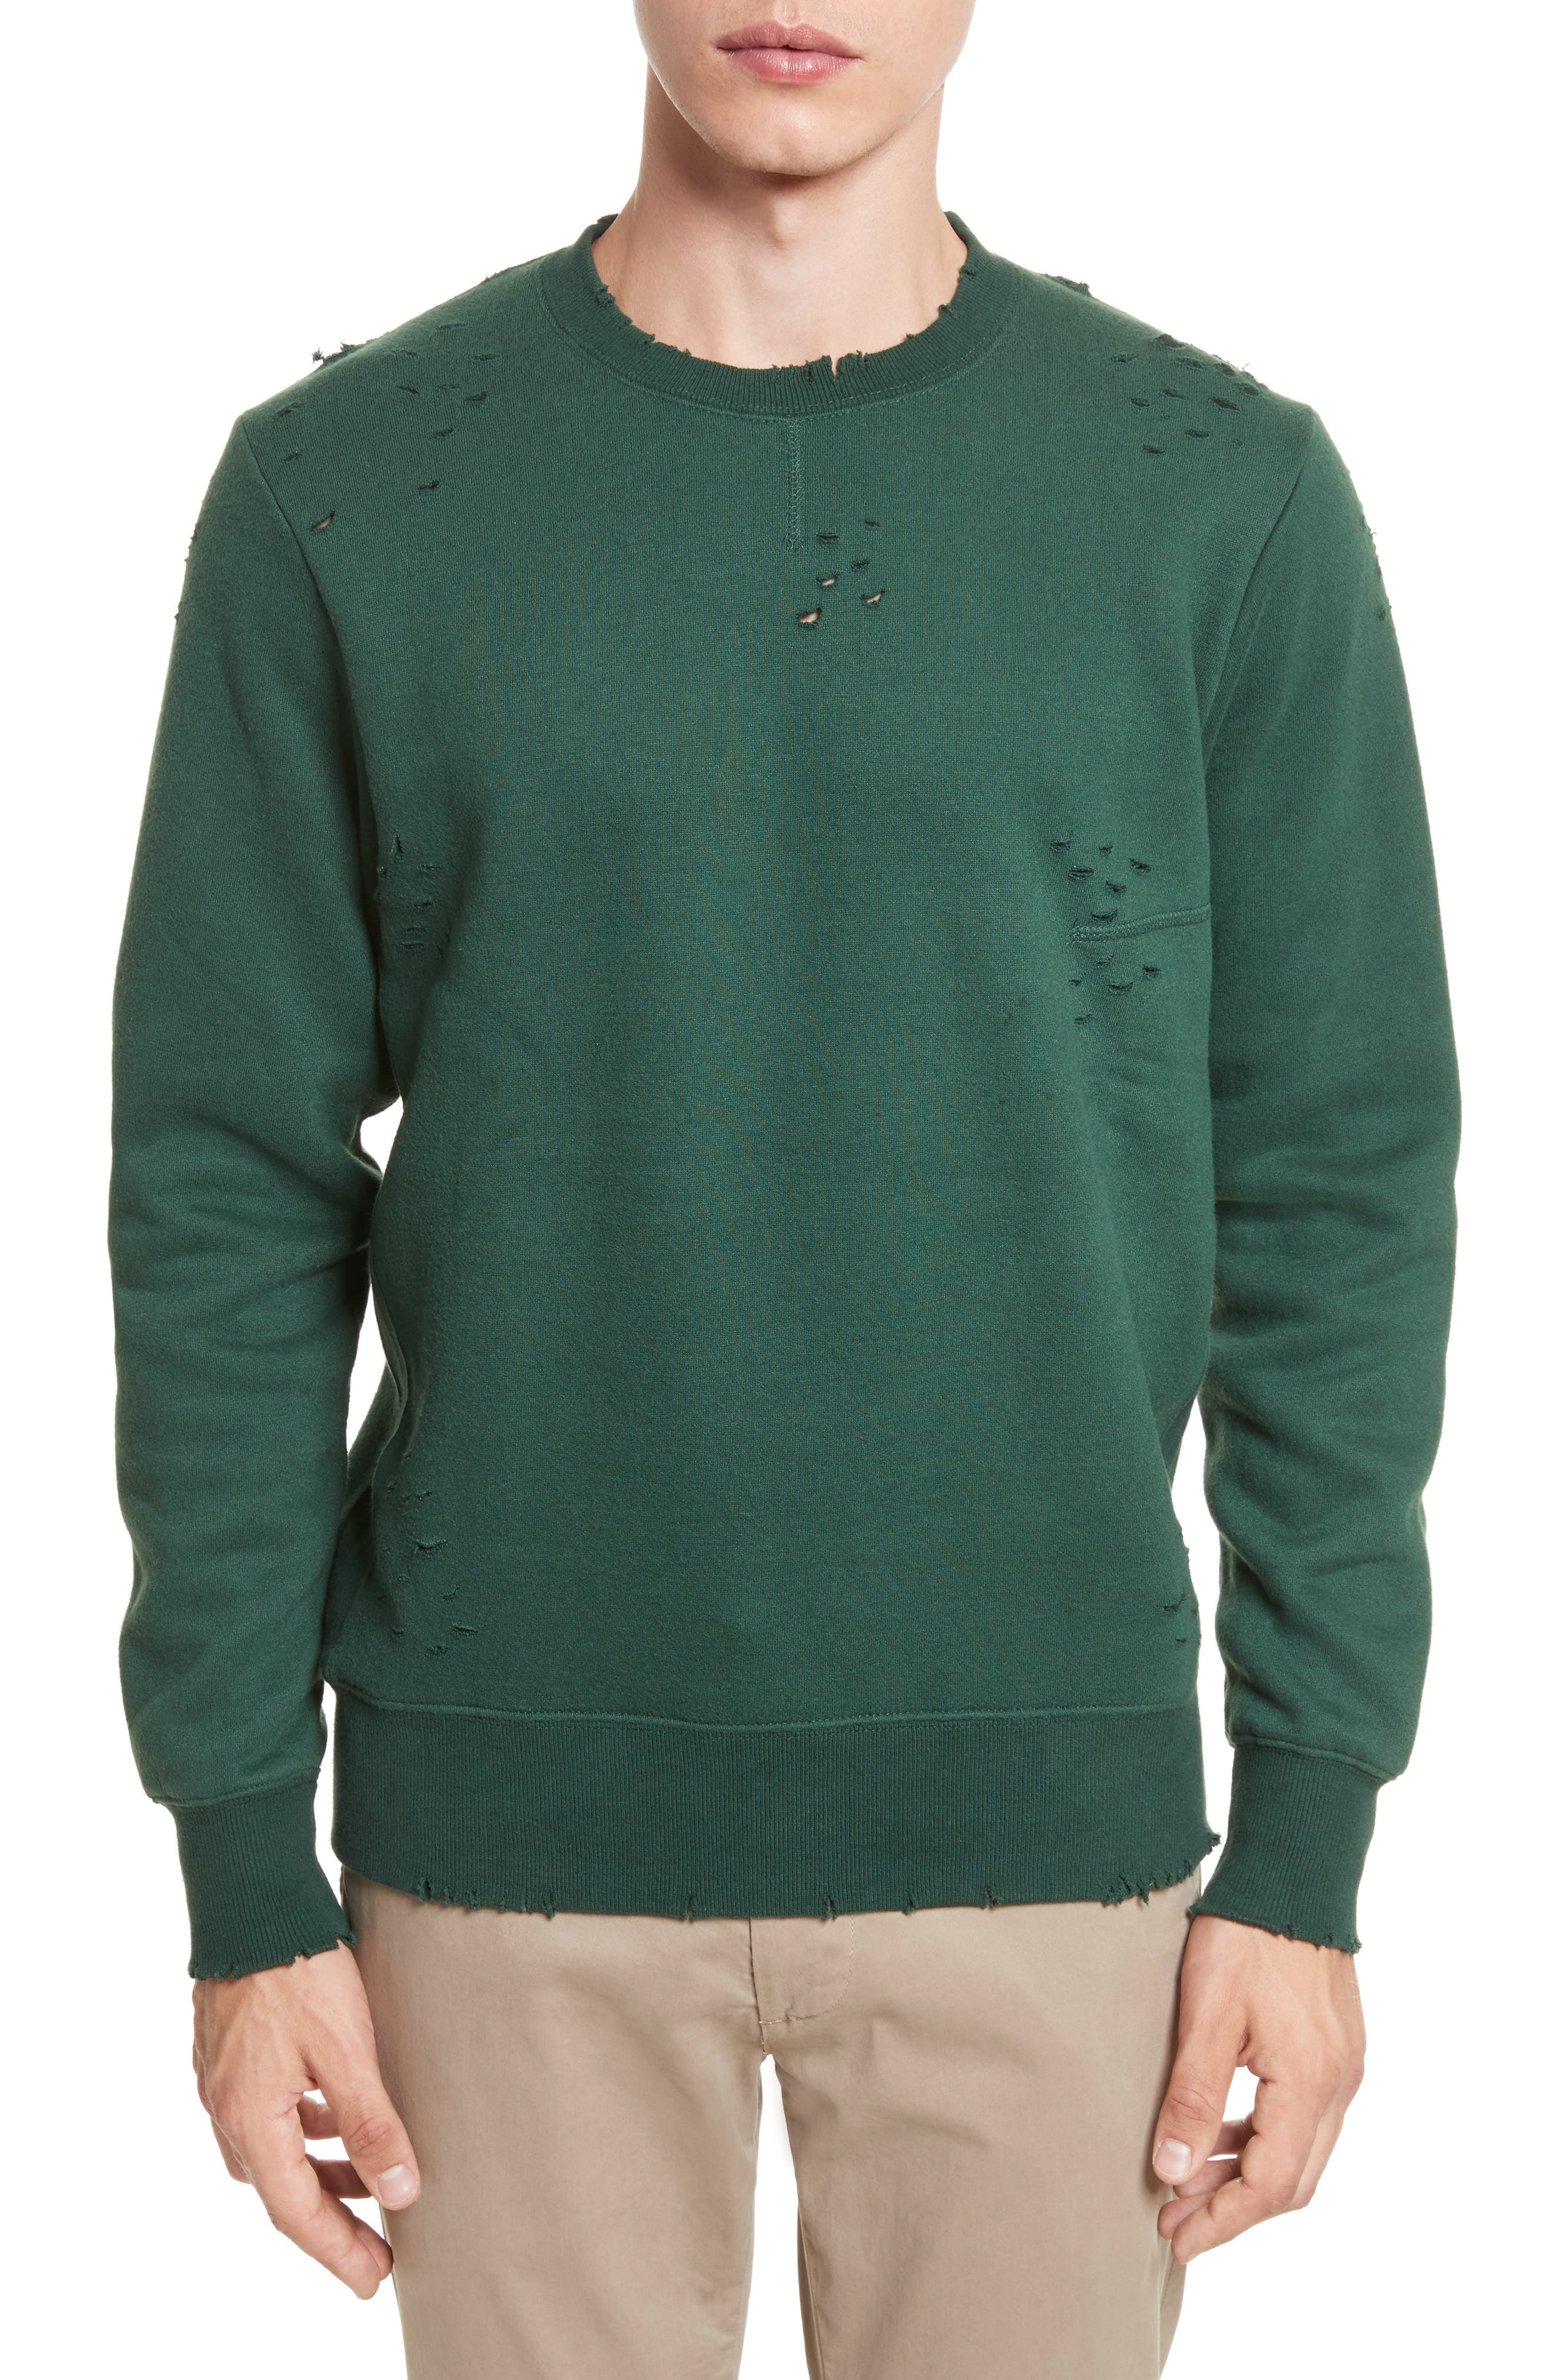 OVADIA & SONS Crewneck Sweater